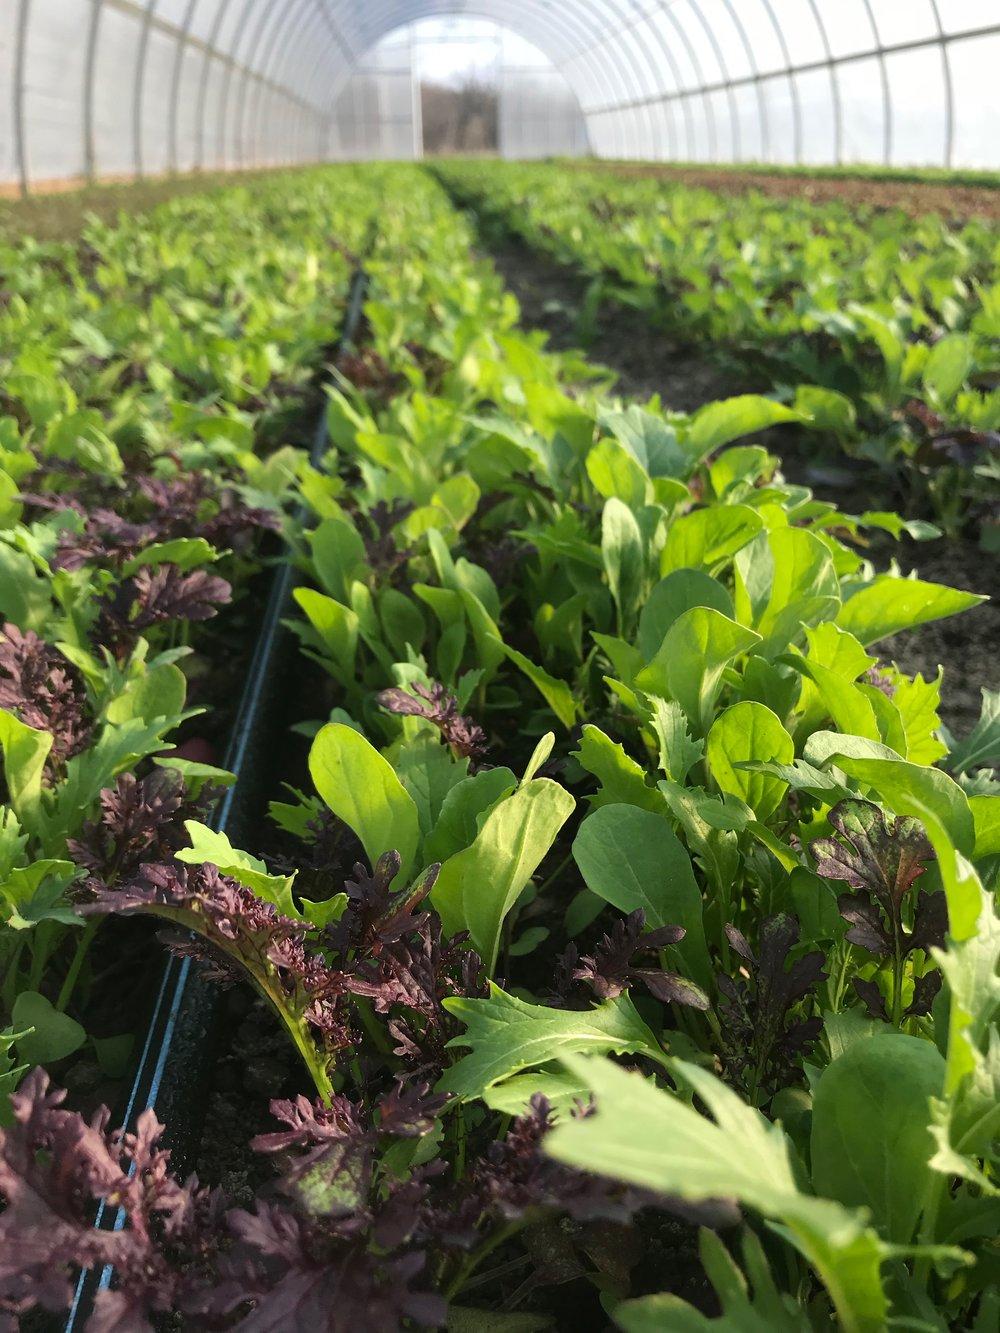 Juniper Hill Farms - Corporate CSA program is coming!